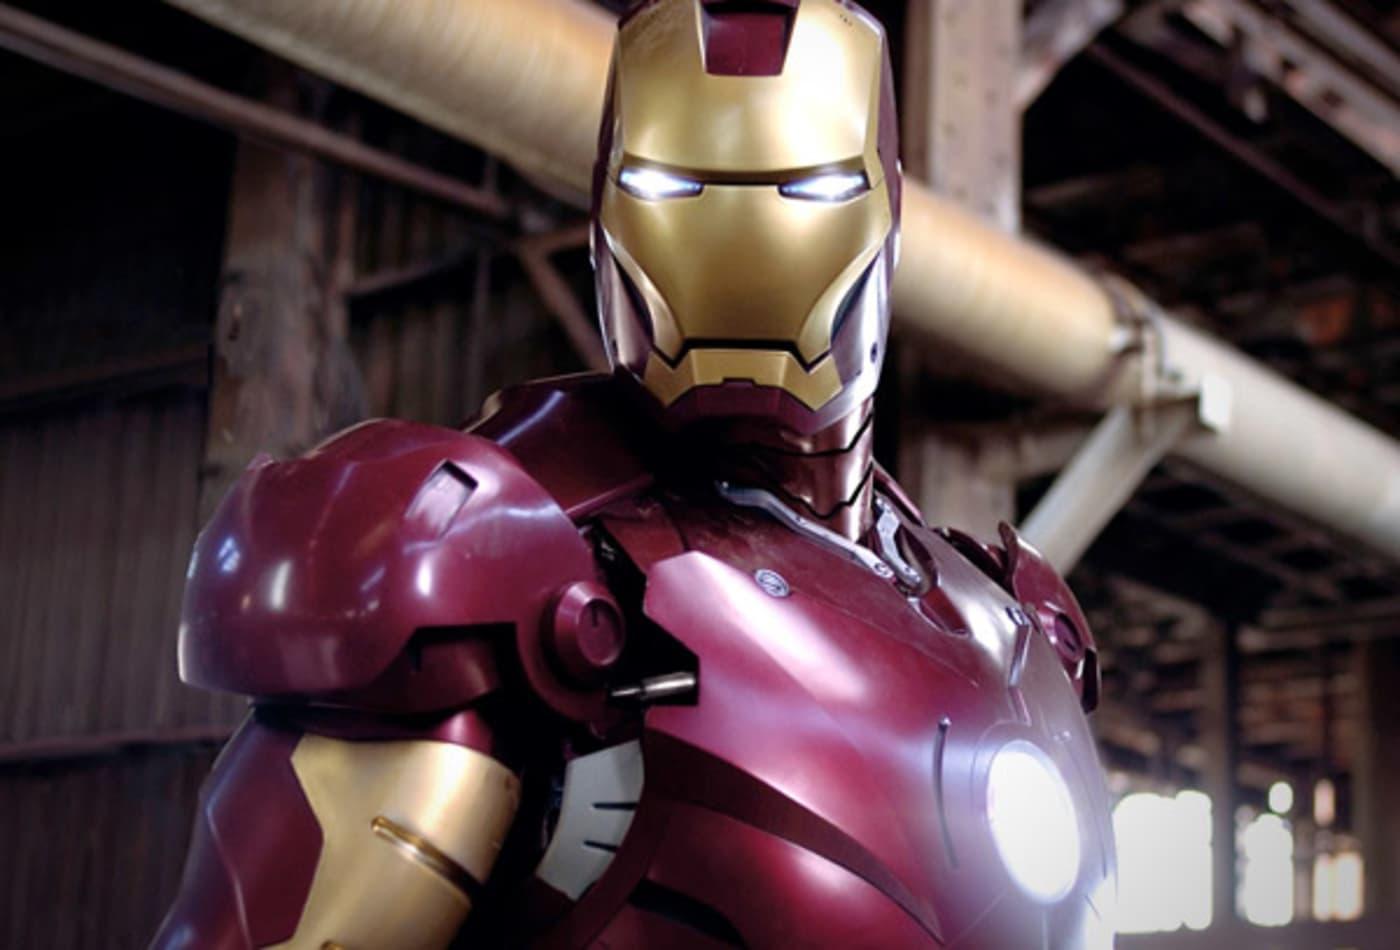 46955353 CNBC_superhero_films_2011_Iron.jpg